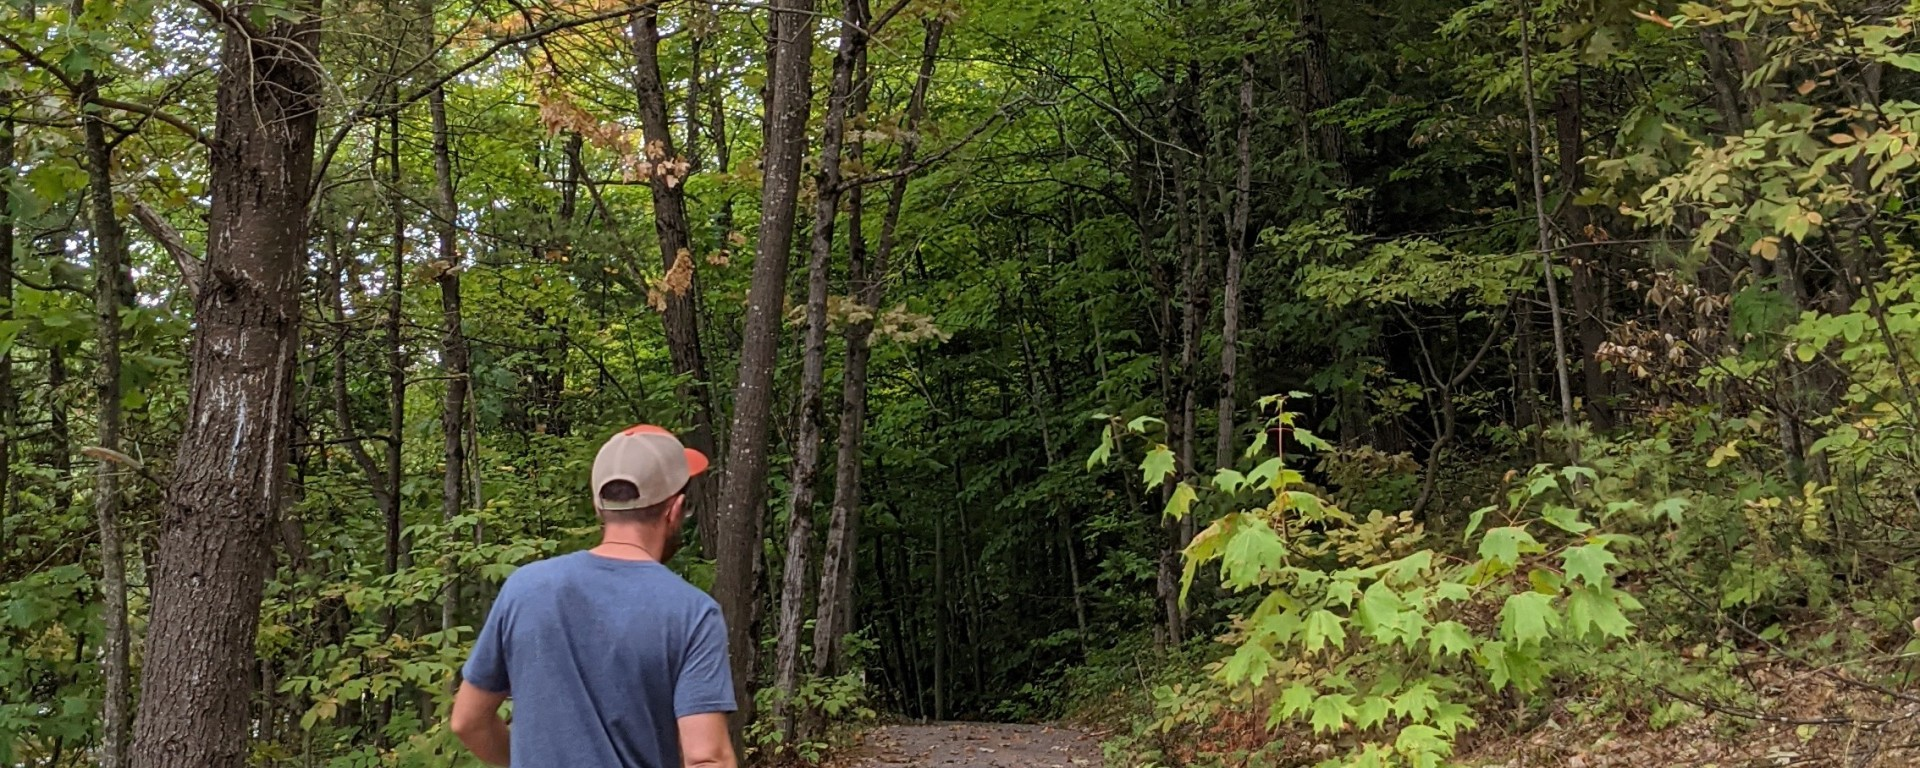 Sentier fin août, parc de la rivière Batiscan